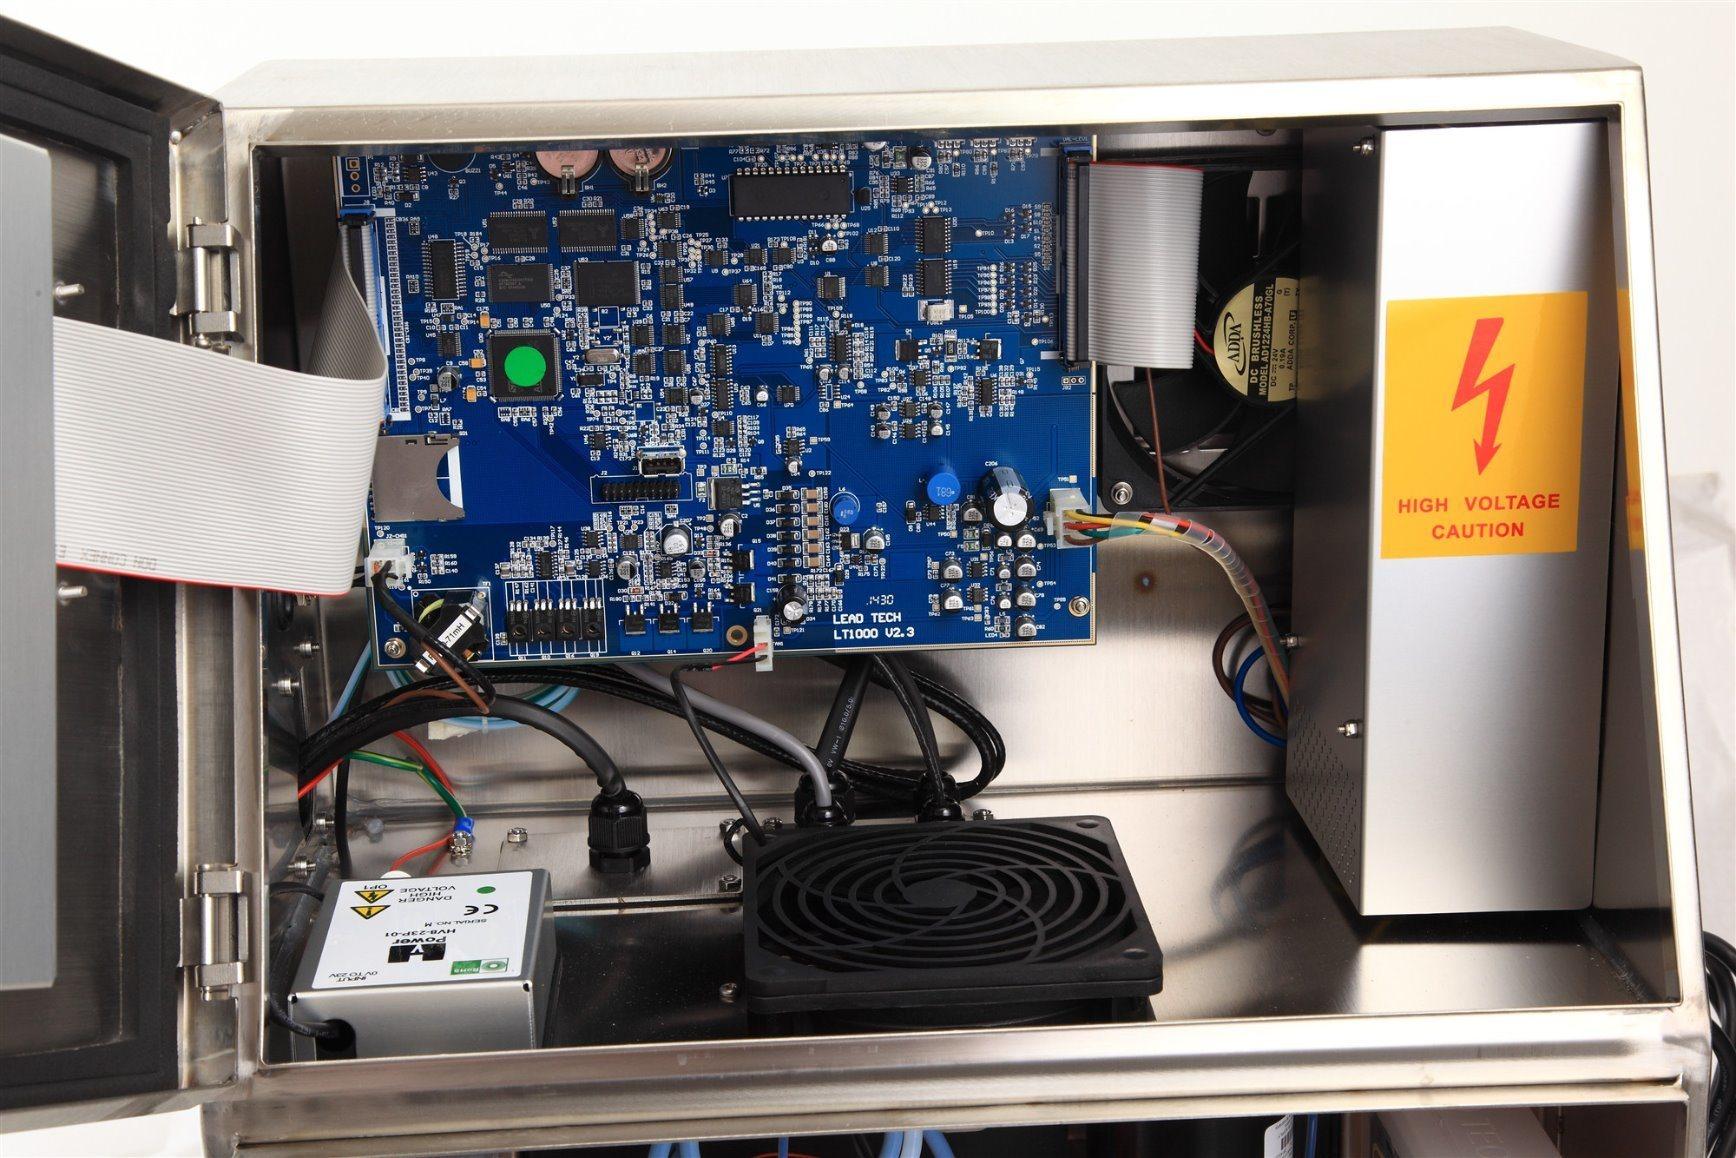 Lead Tech Lt720 Pigment Cij Printer for Dark Cables